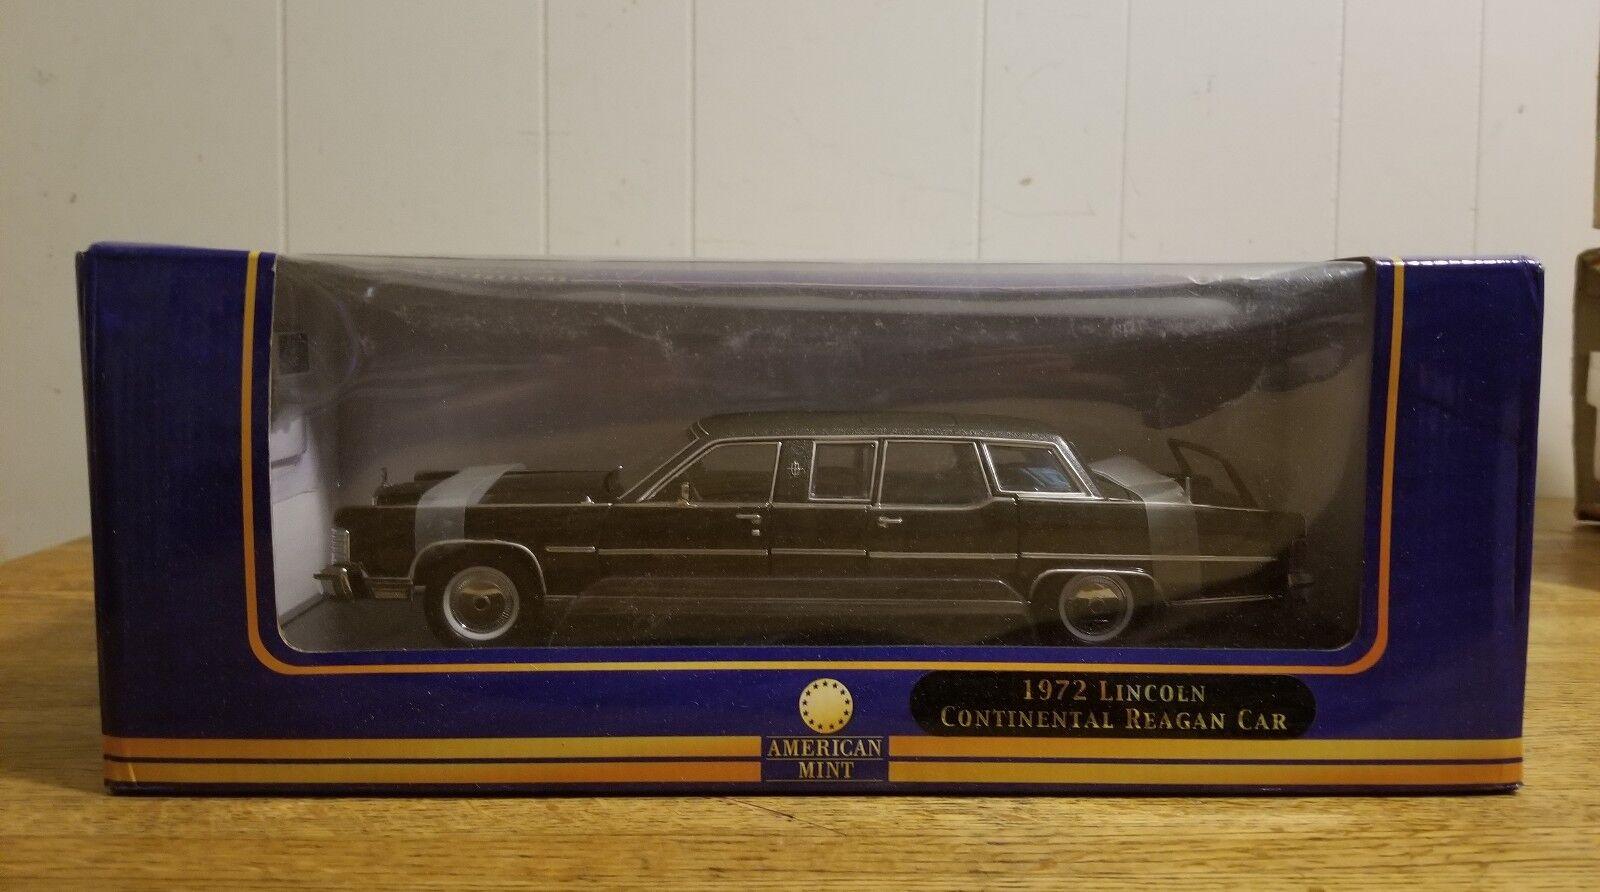 1972 Lincoln Continental Reagan Limousine 1 24 Diecast Car Model